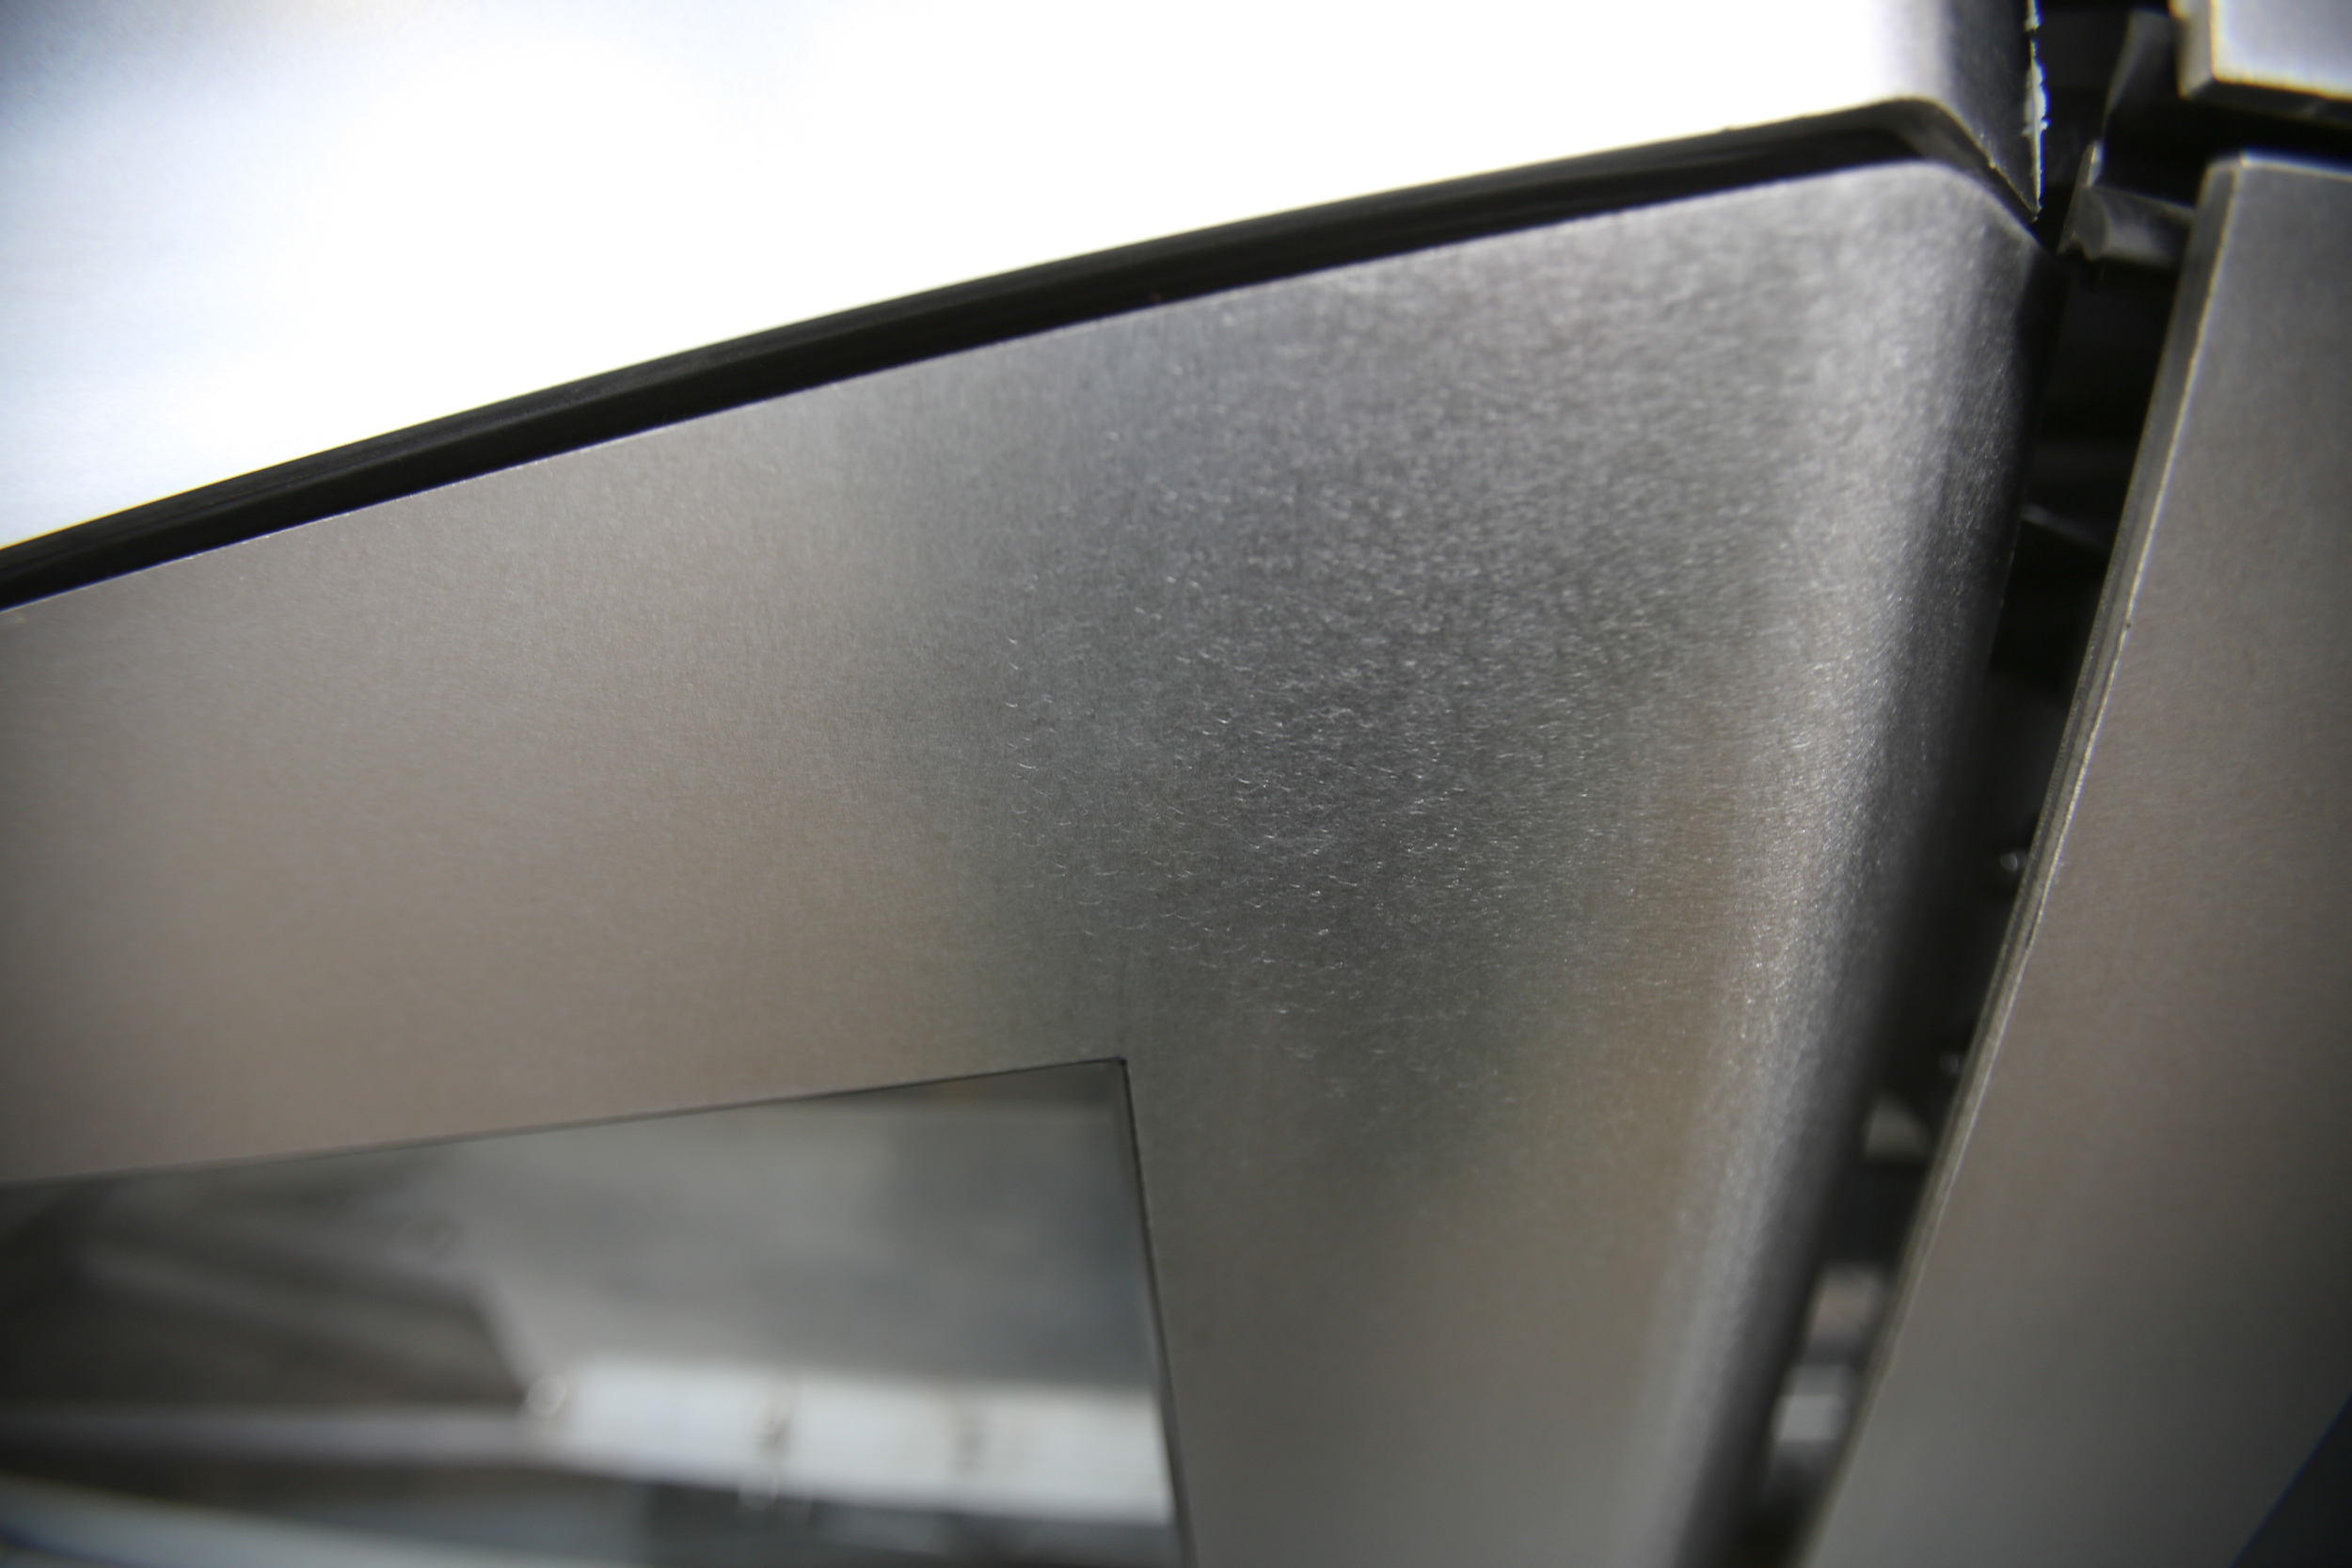 kammetal-1WTC Beacon-304.jpg